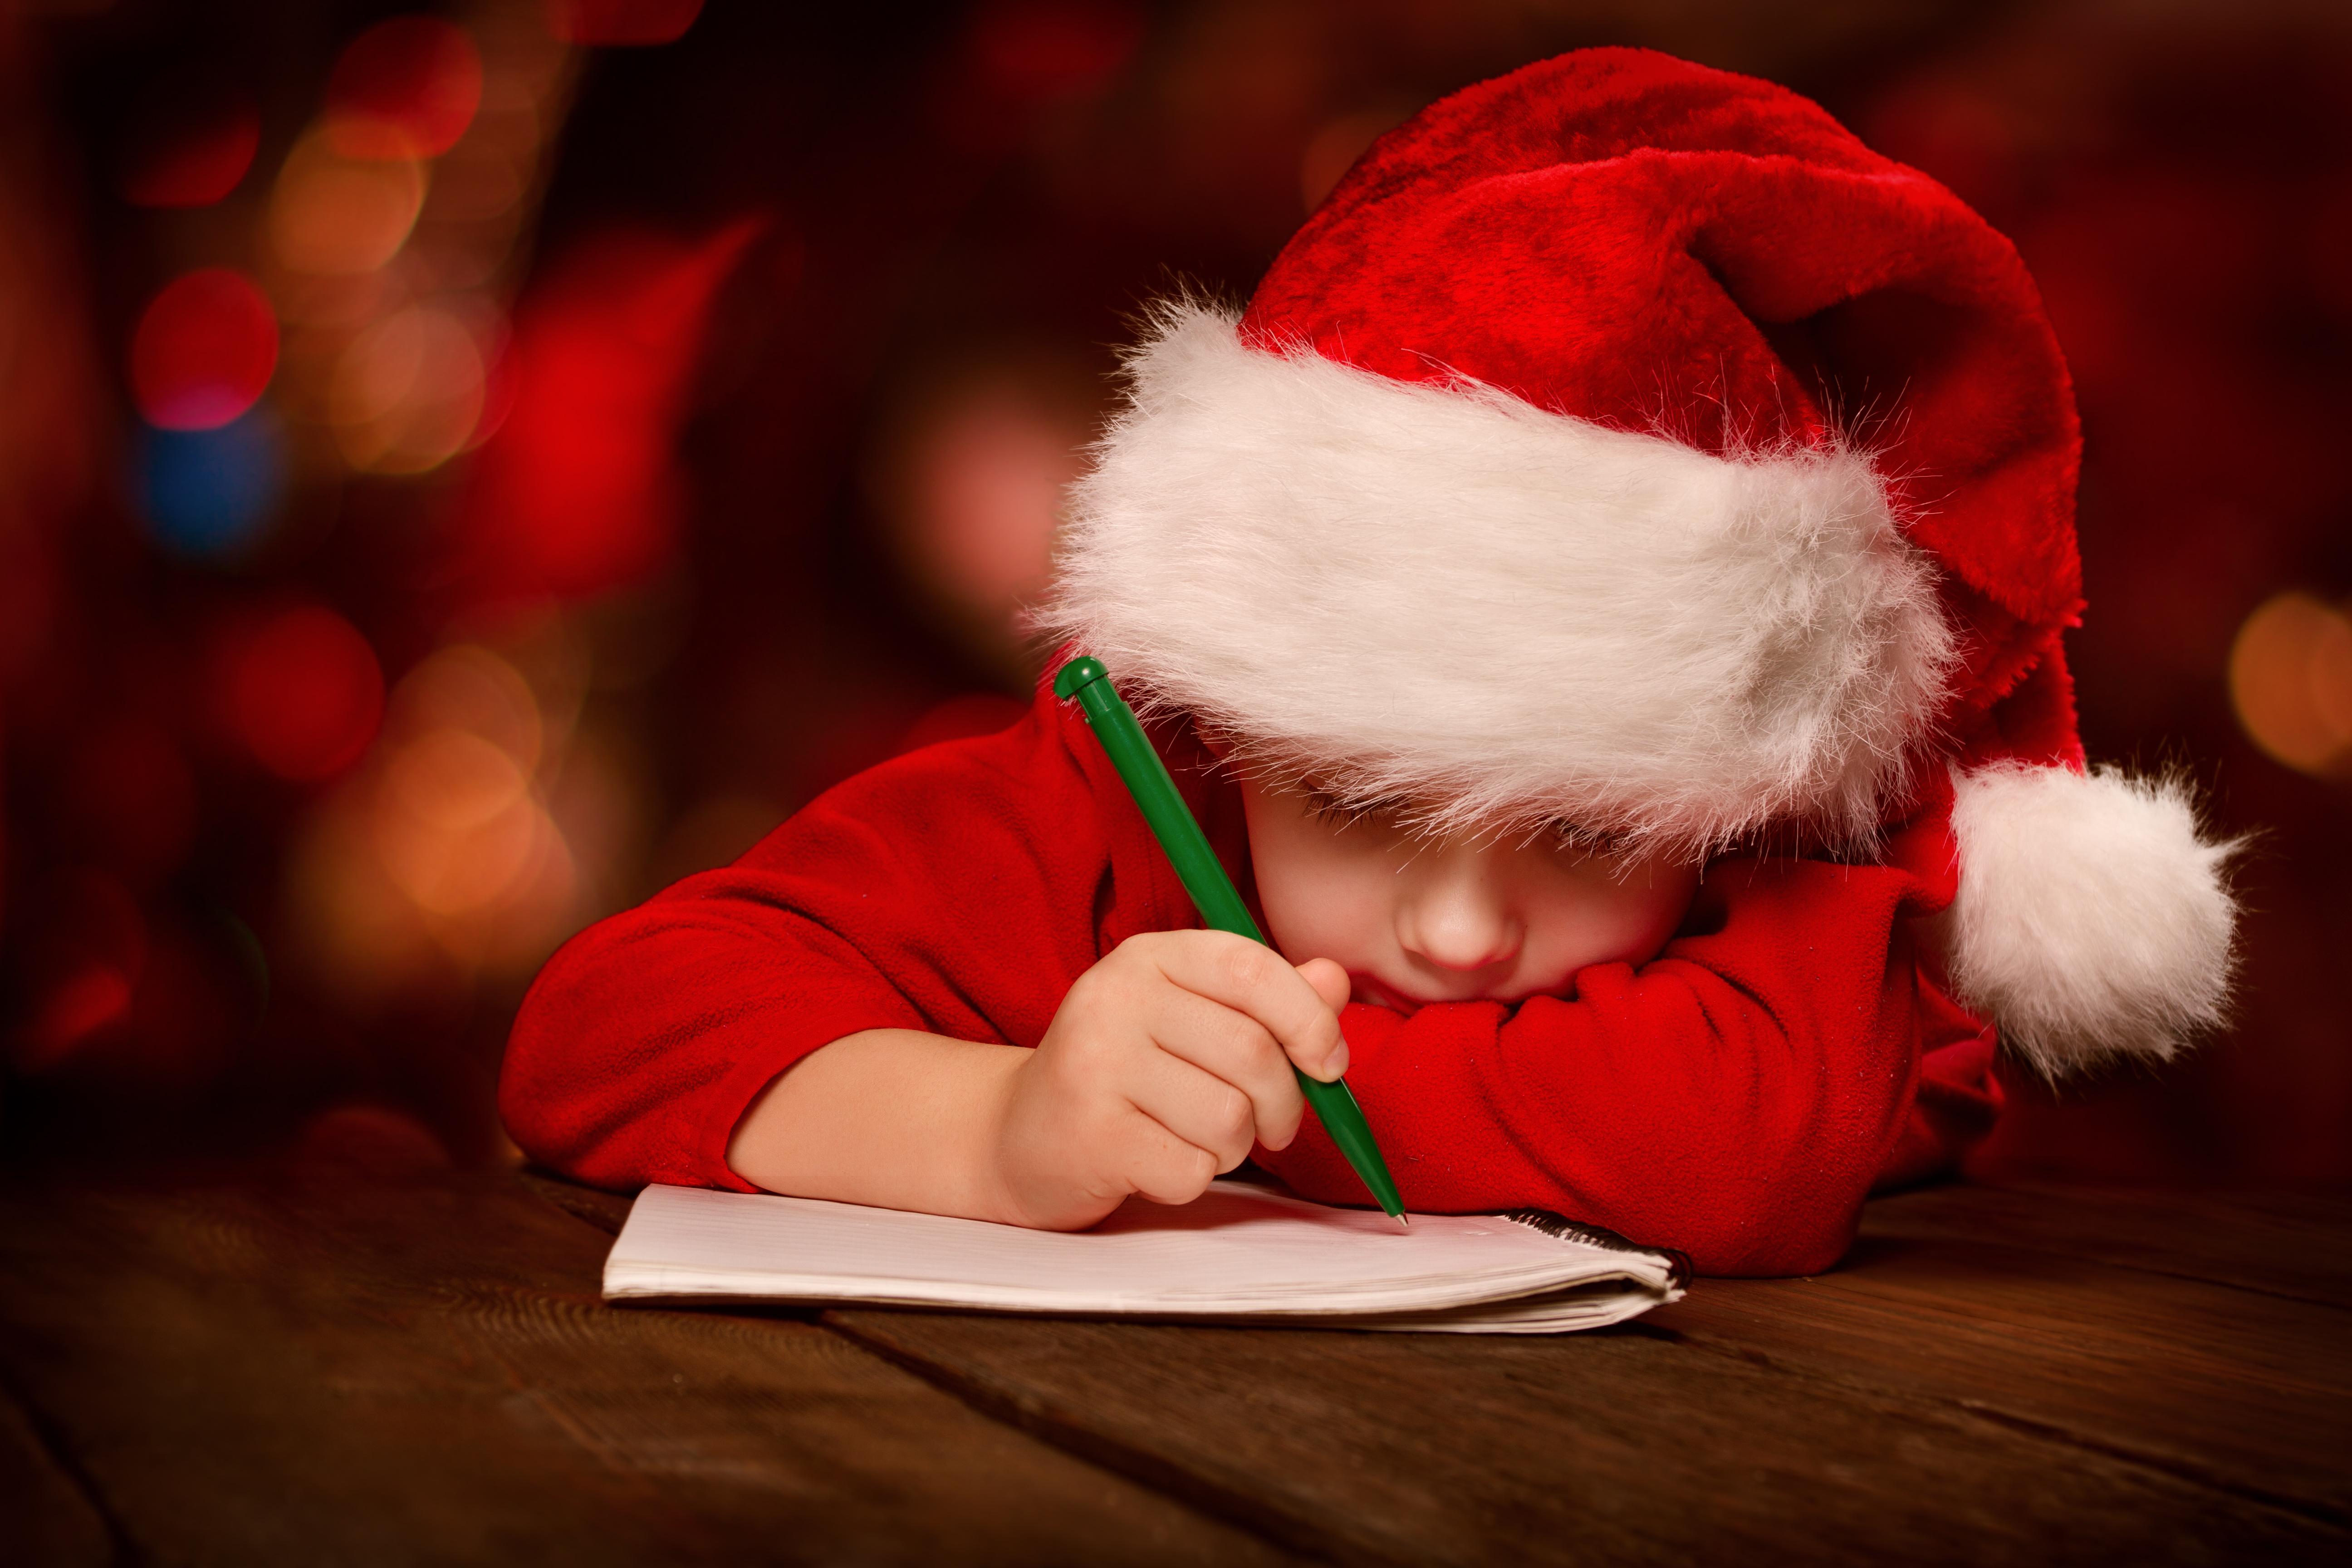 Scrisoarea unei fetite catre Mos Craciun a devenit virala. Ce i-a cerut a emotionat o lume intreaga